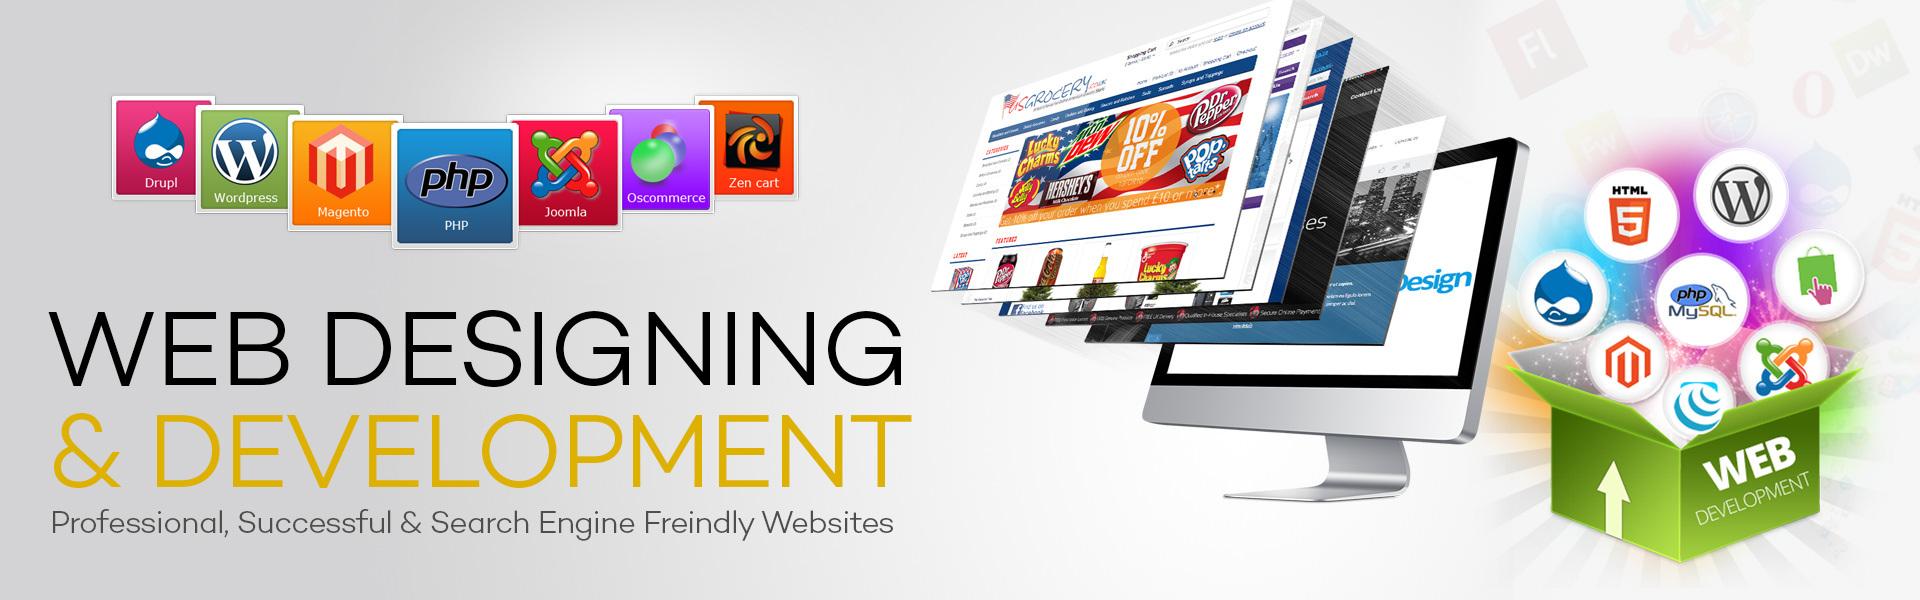 webdesigning.jpg